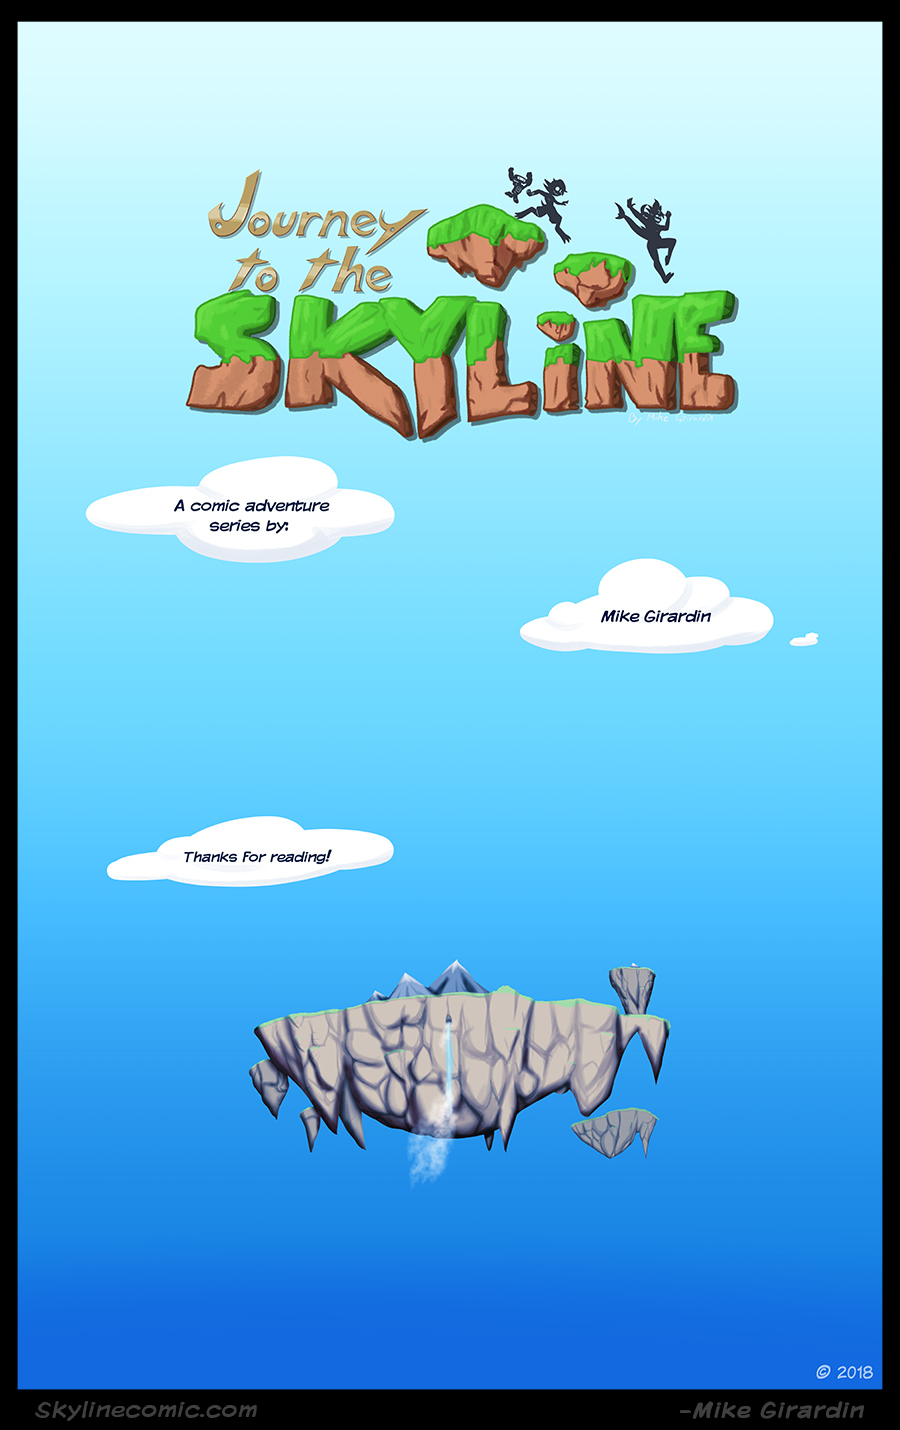 Journey to the Skyline credits